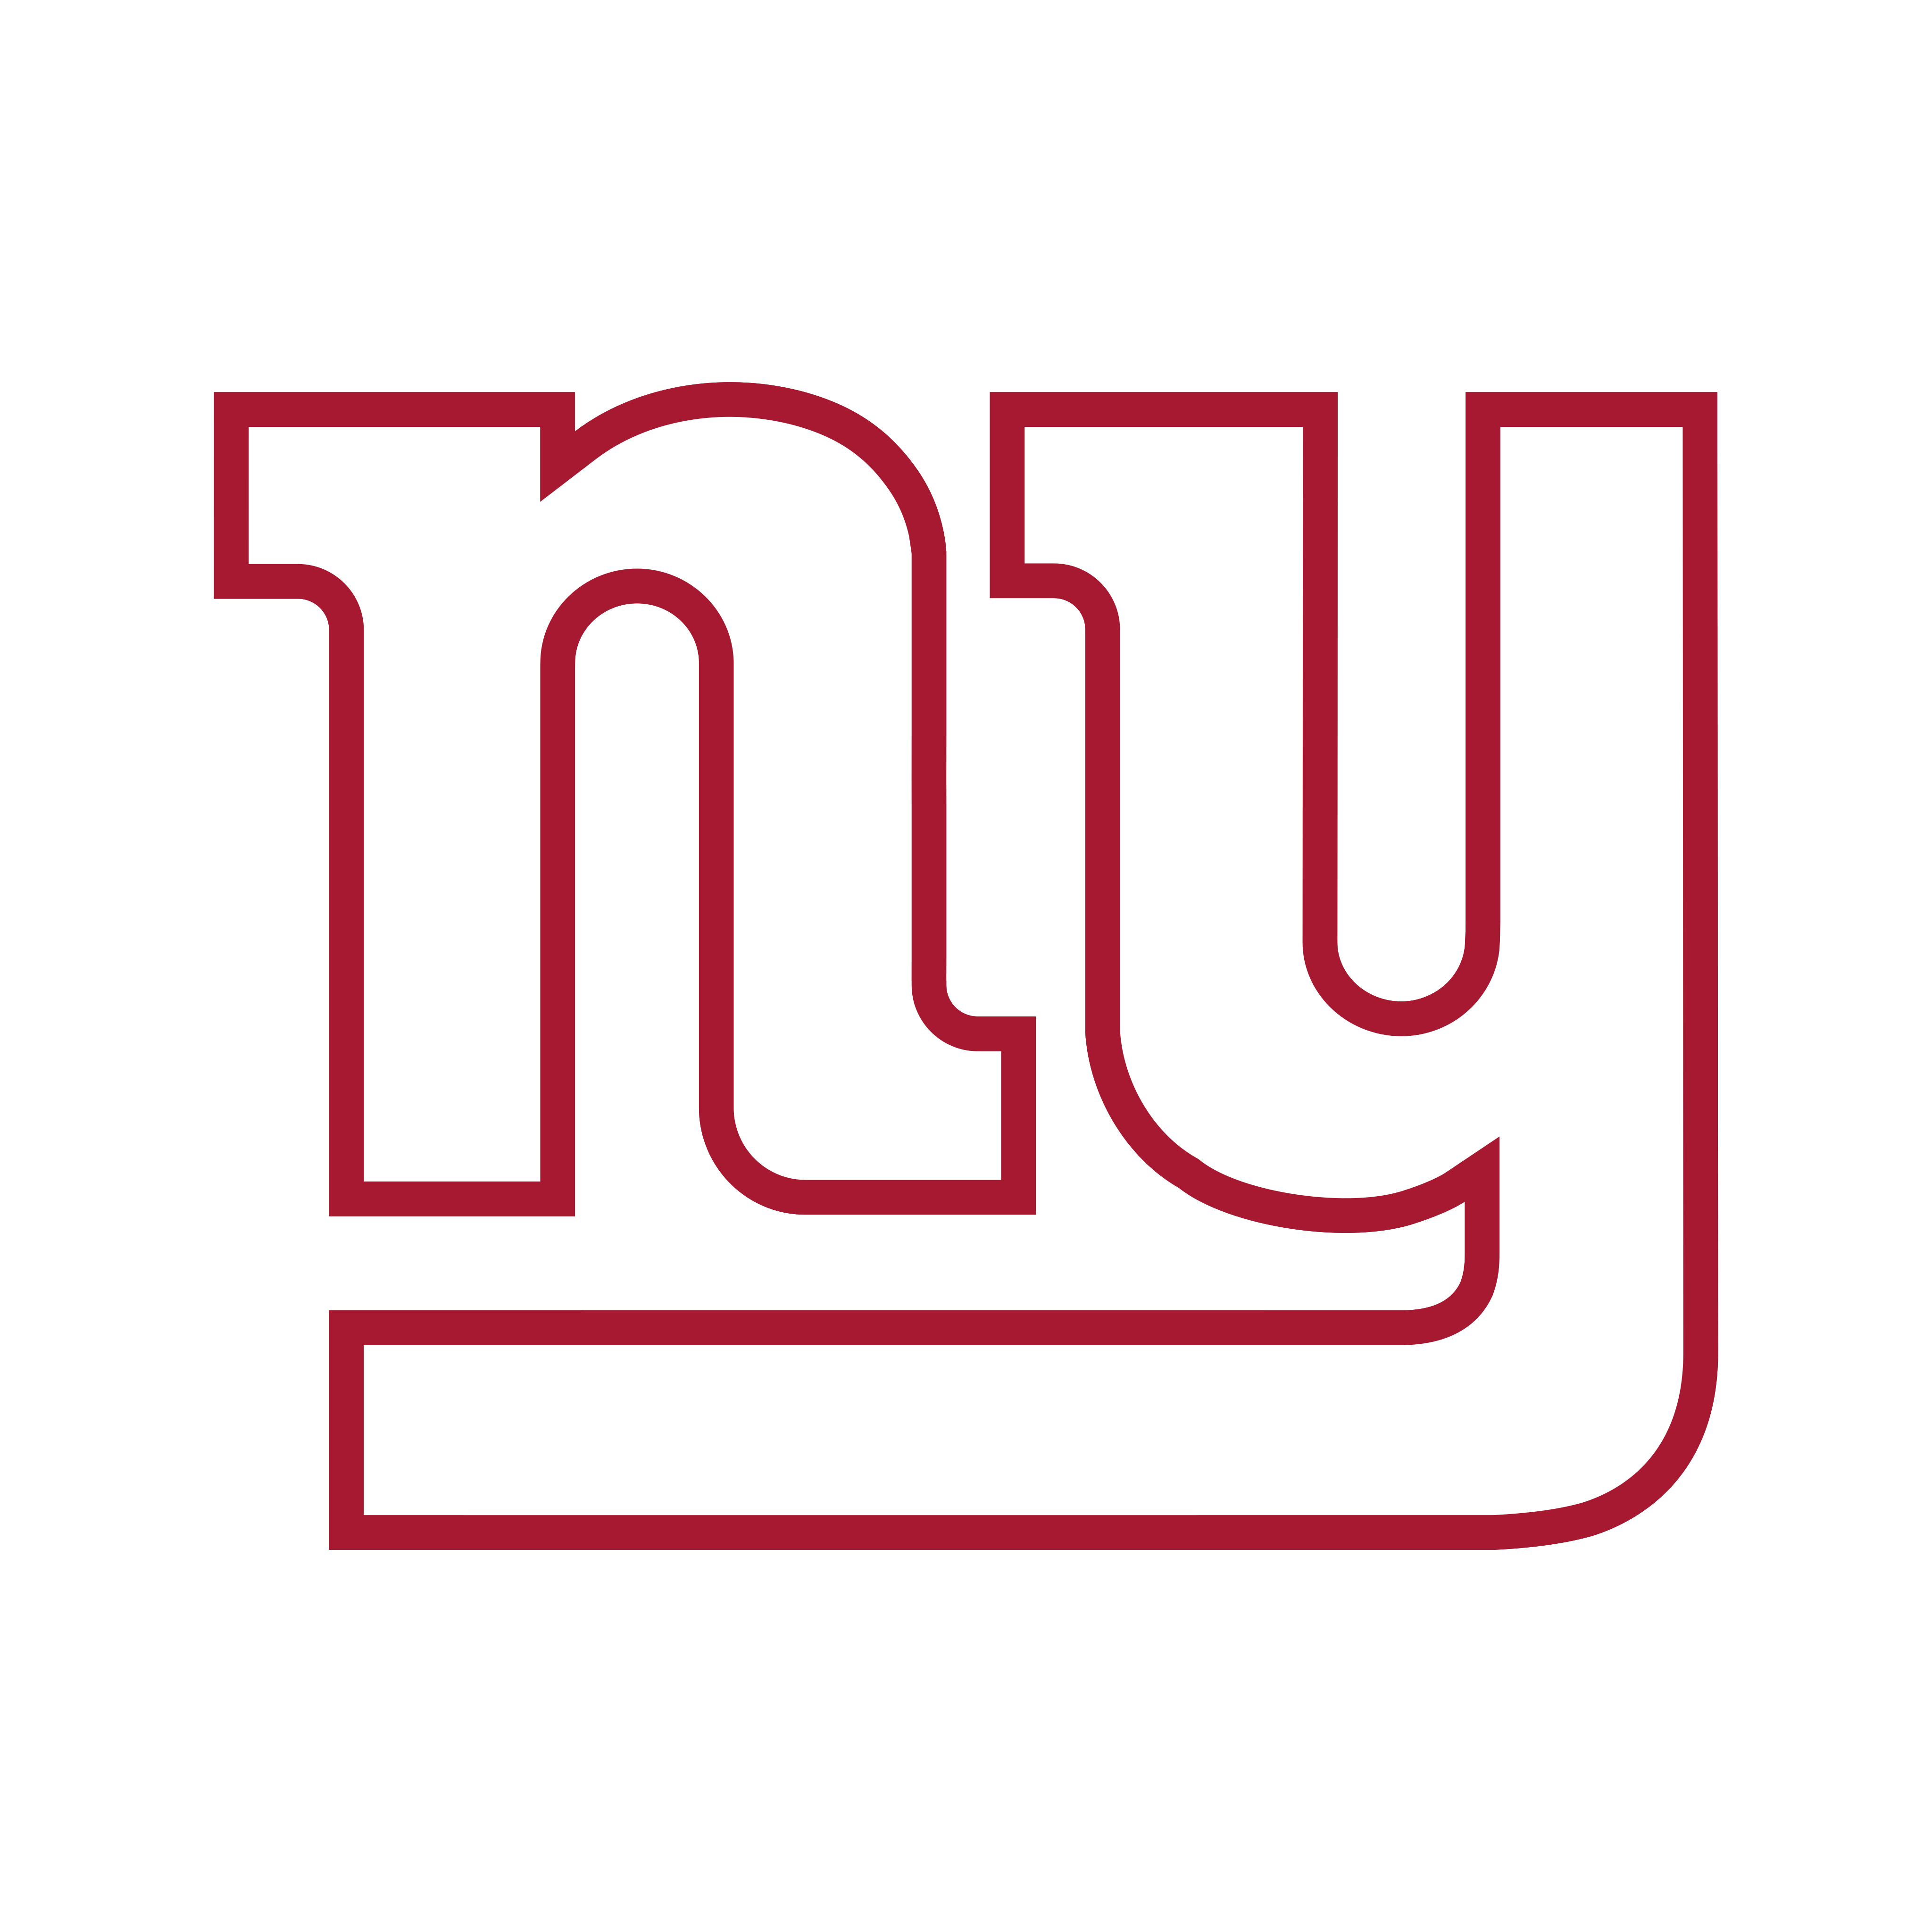 new york giants logo 0 - New York Giants Logo